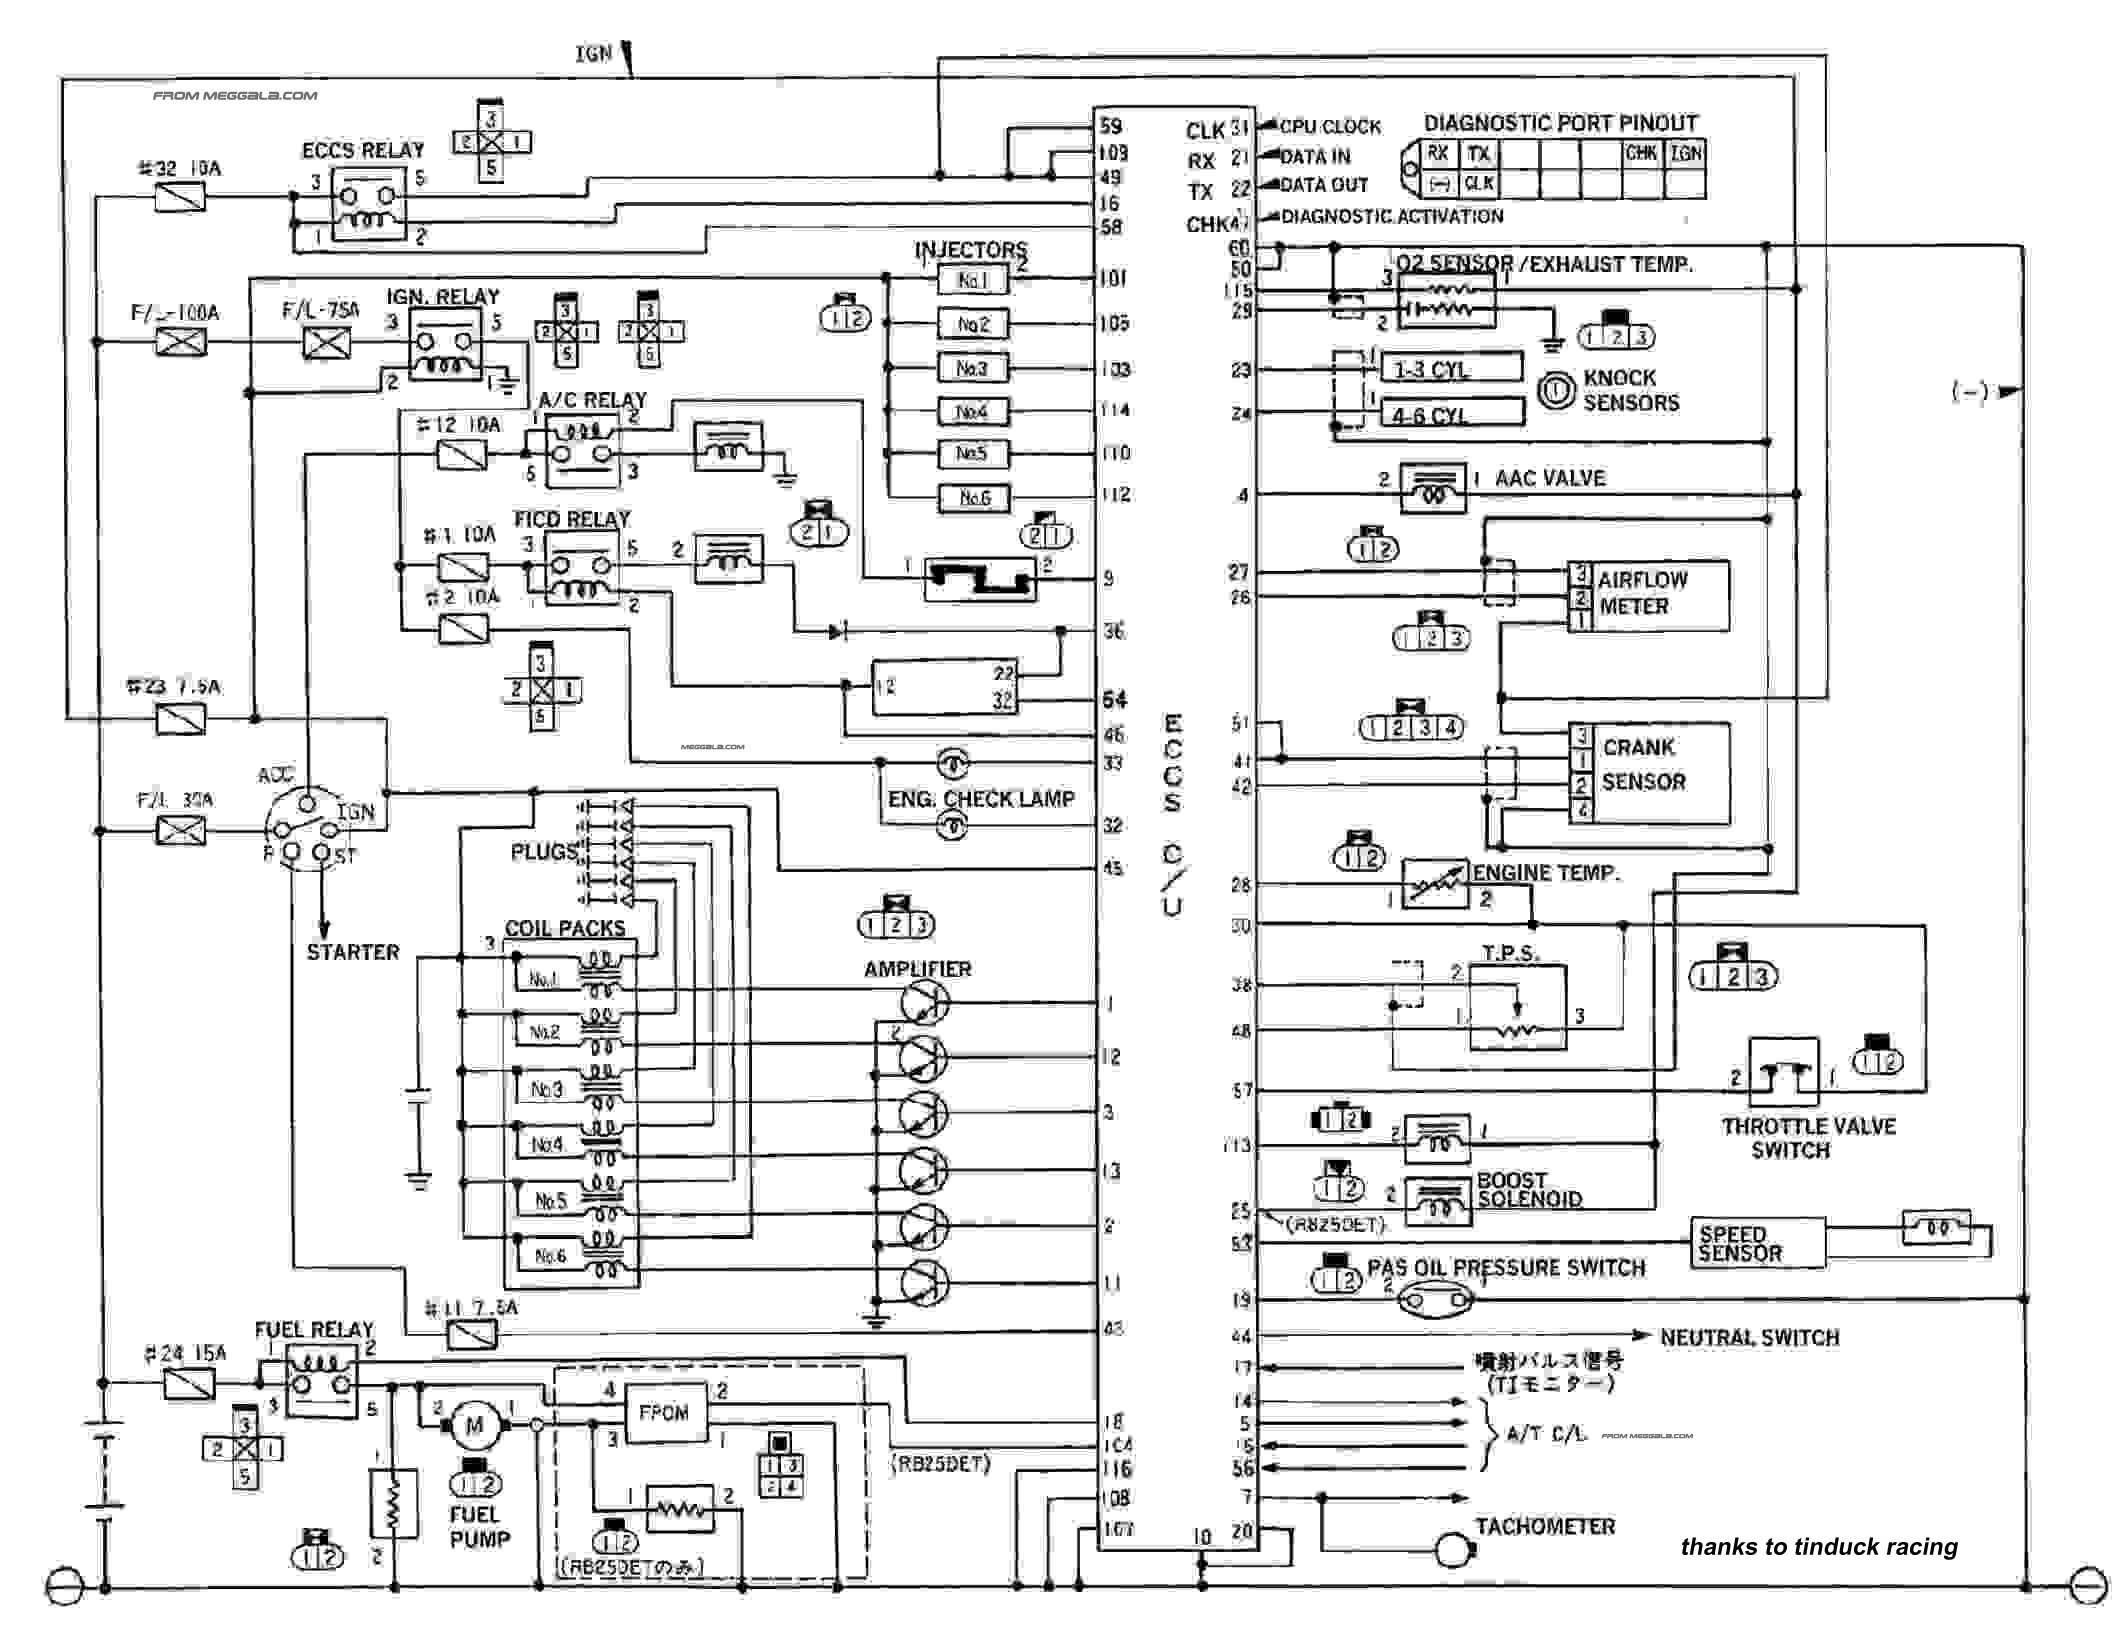 2004 Infiniti Fx35 Wiring Diagram Wiring Diagram Show Show Emilia Fise It